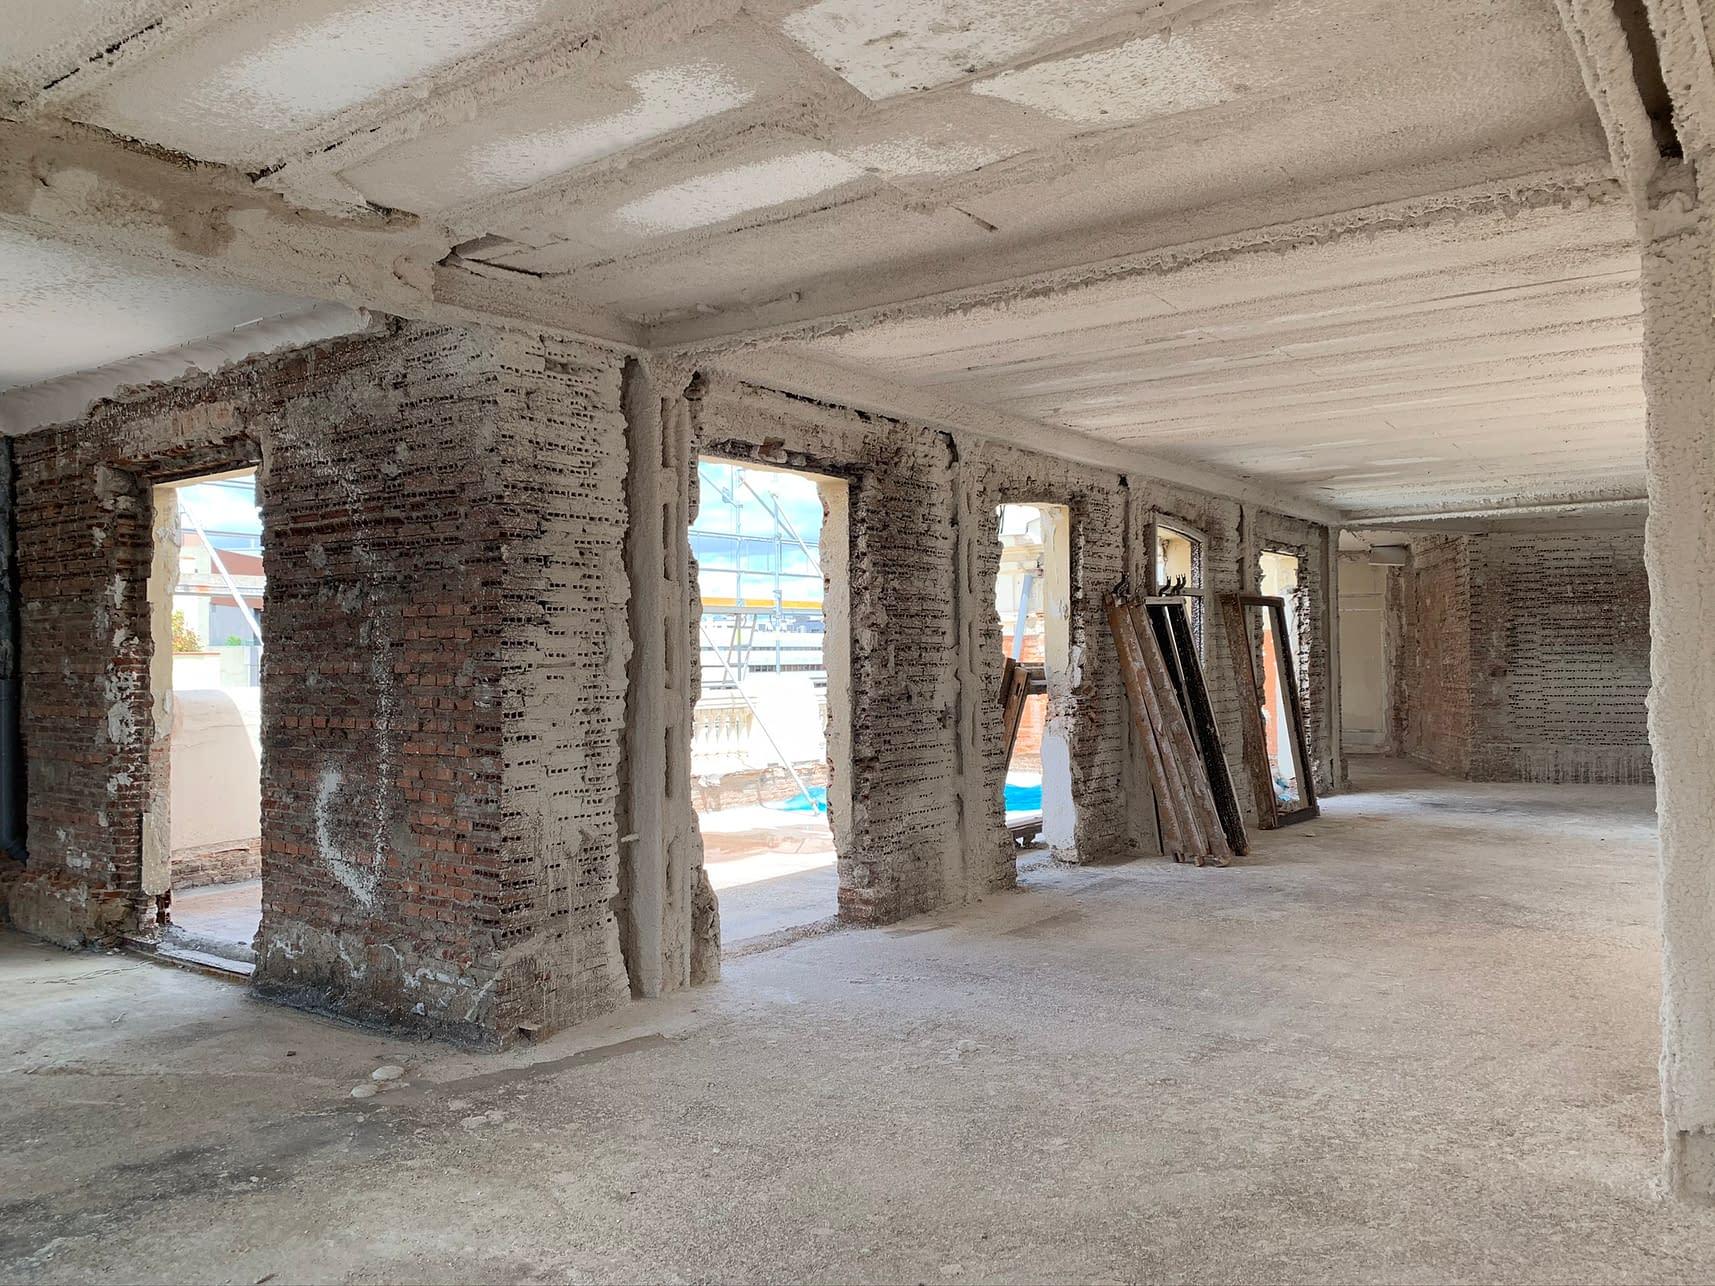 Rehabilitación integral edificio Marqués de Salamanca 11 (1 (114)